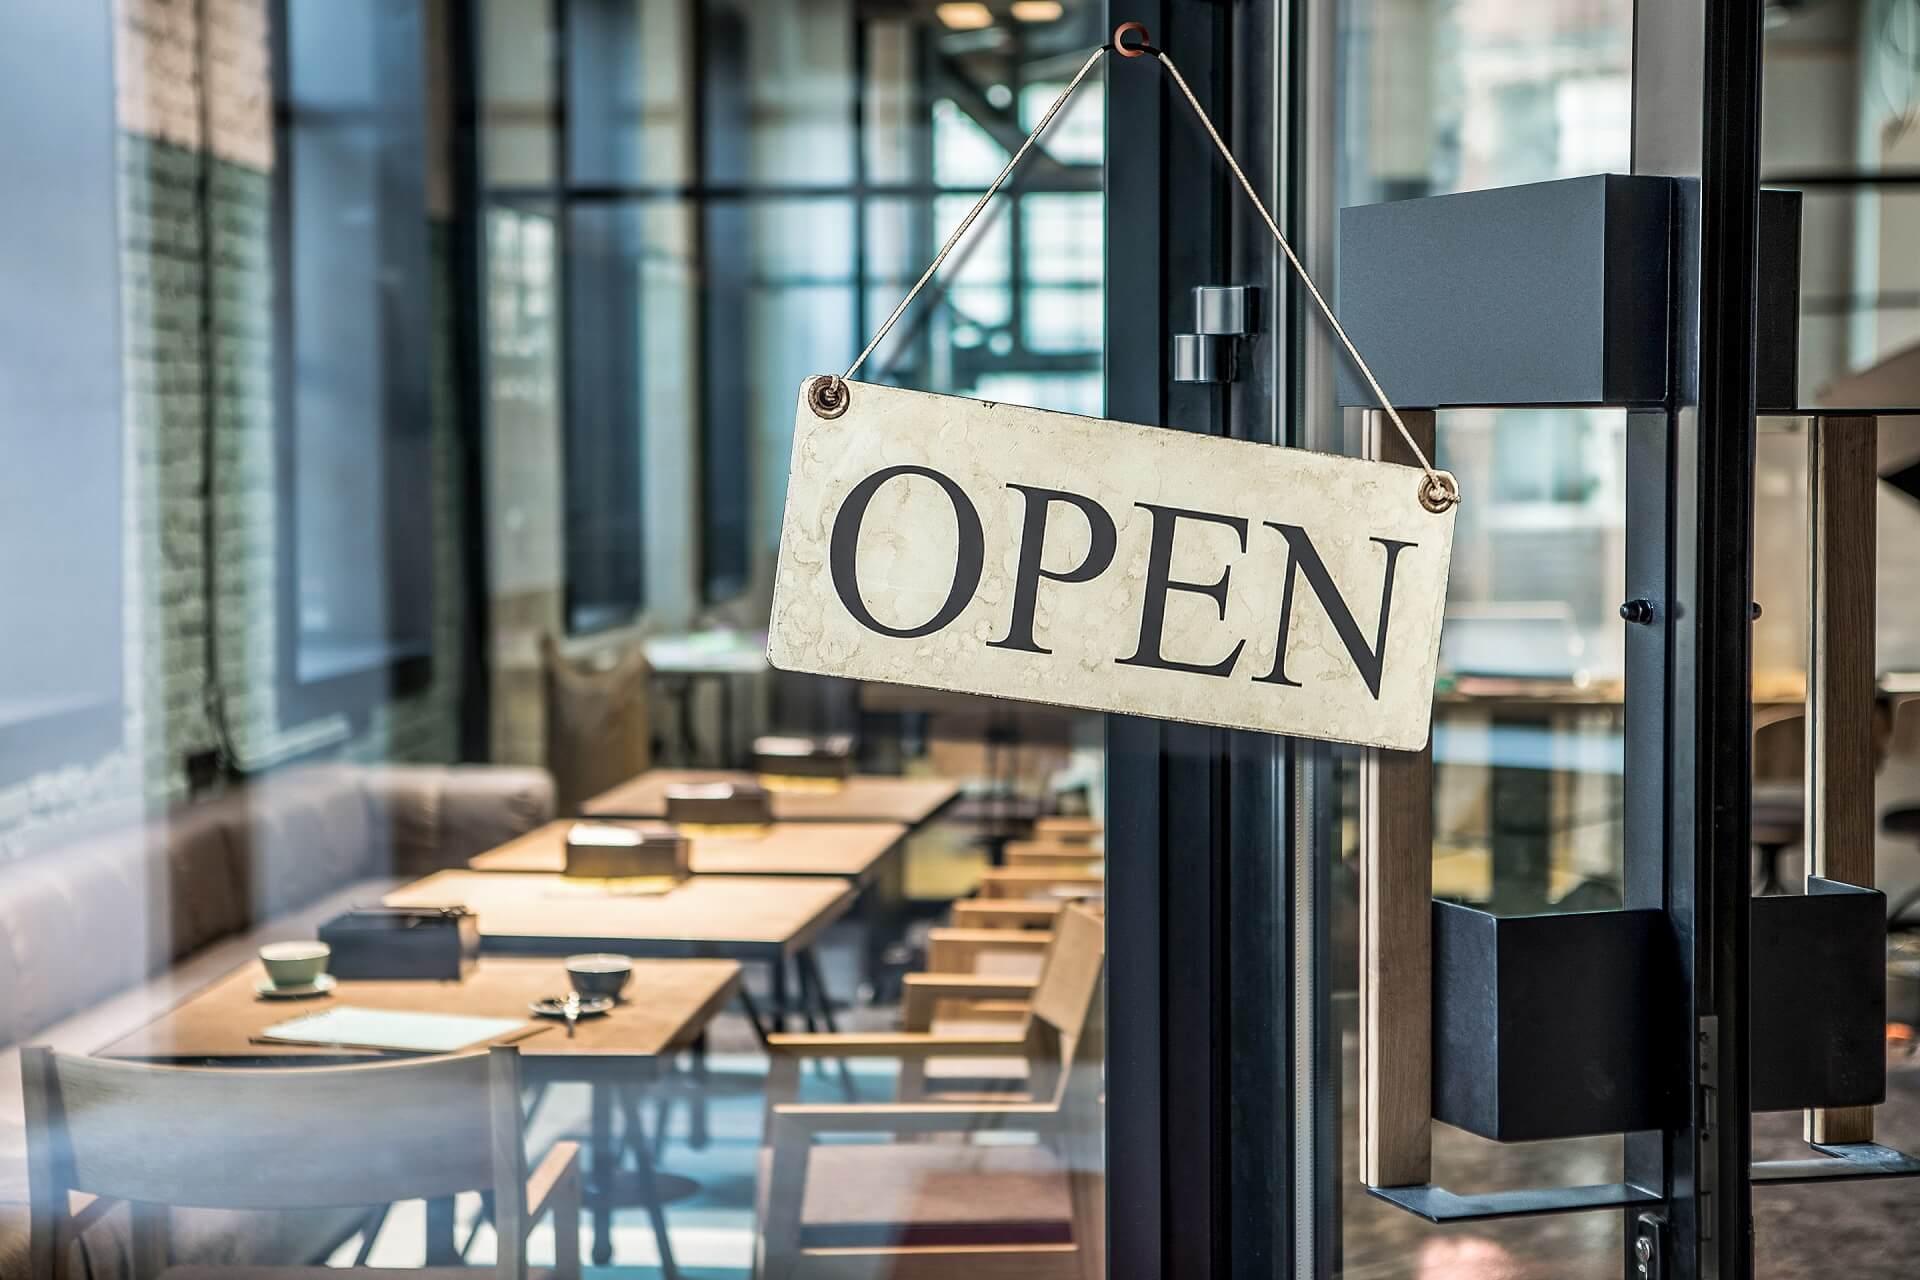 Restaurants reopening, Neuanfang der Gastronomie nach Corona